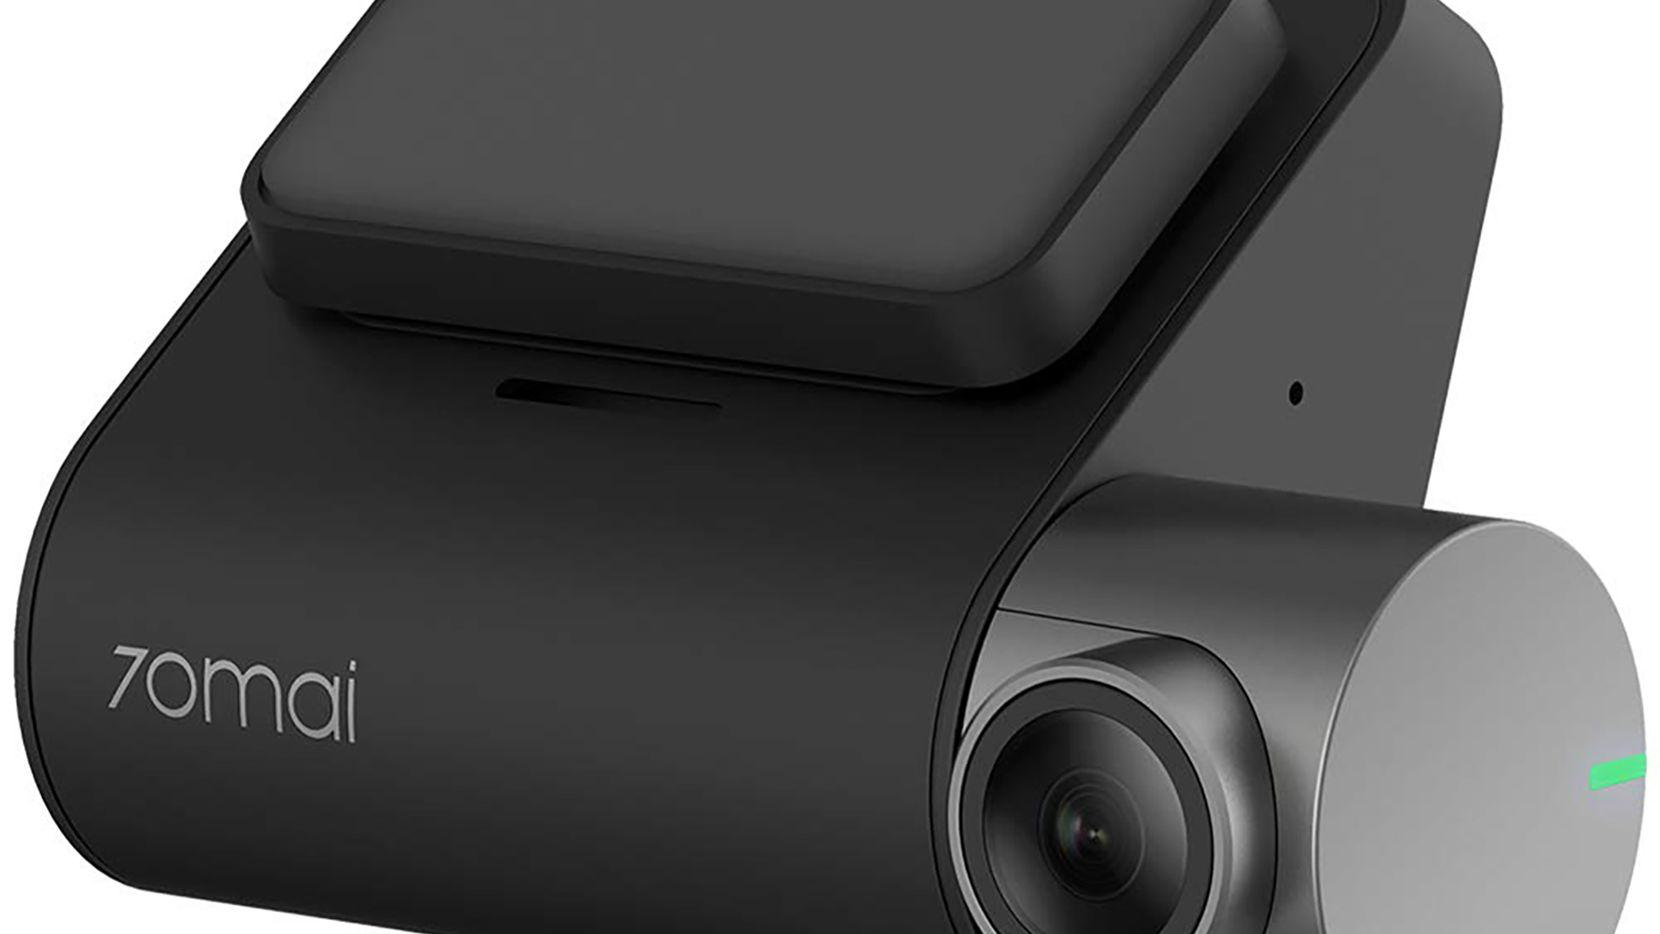 The Xiaomi 70mai Dash Cam Pro